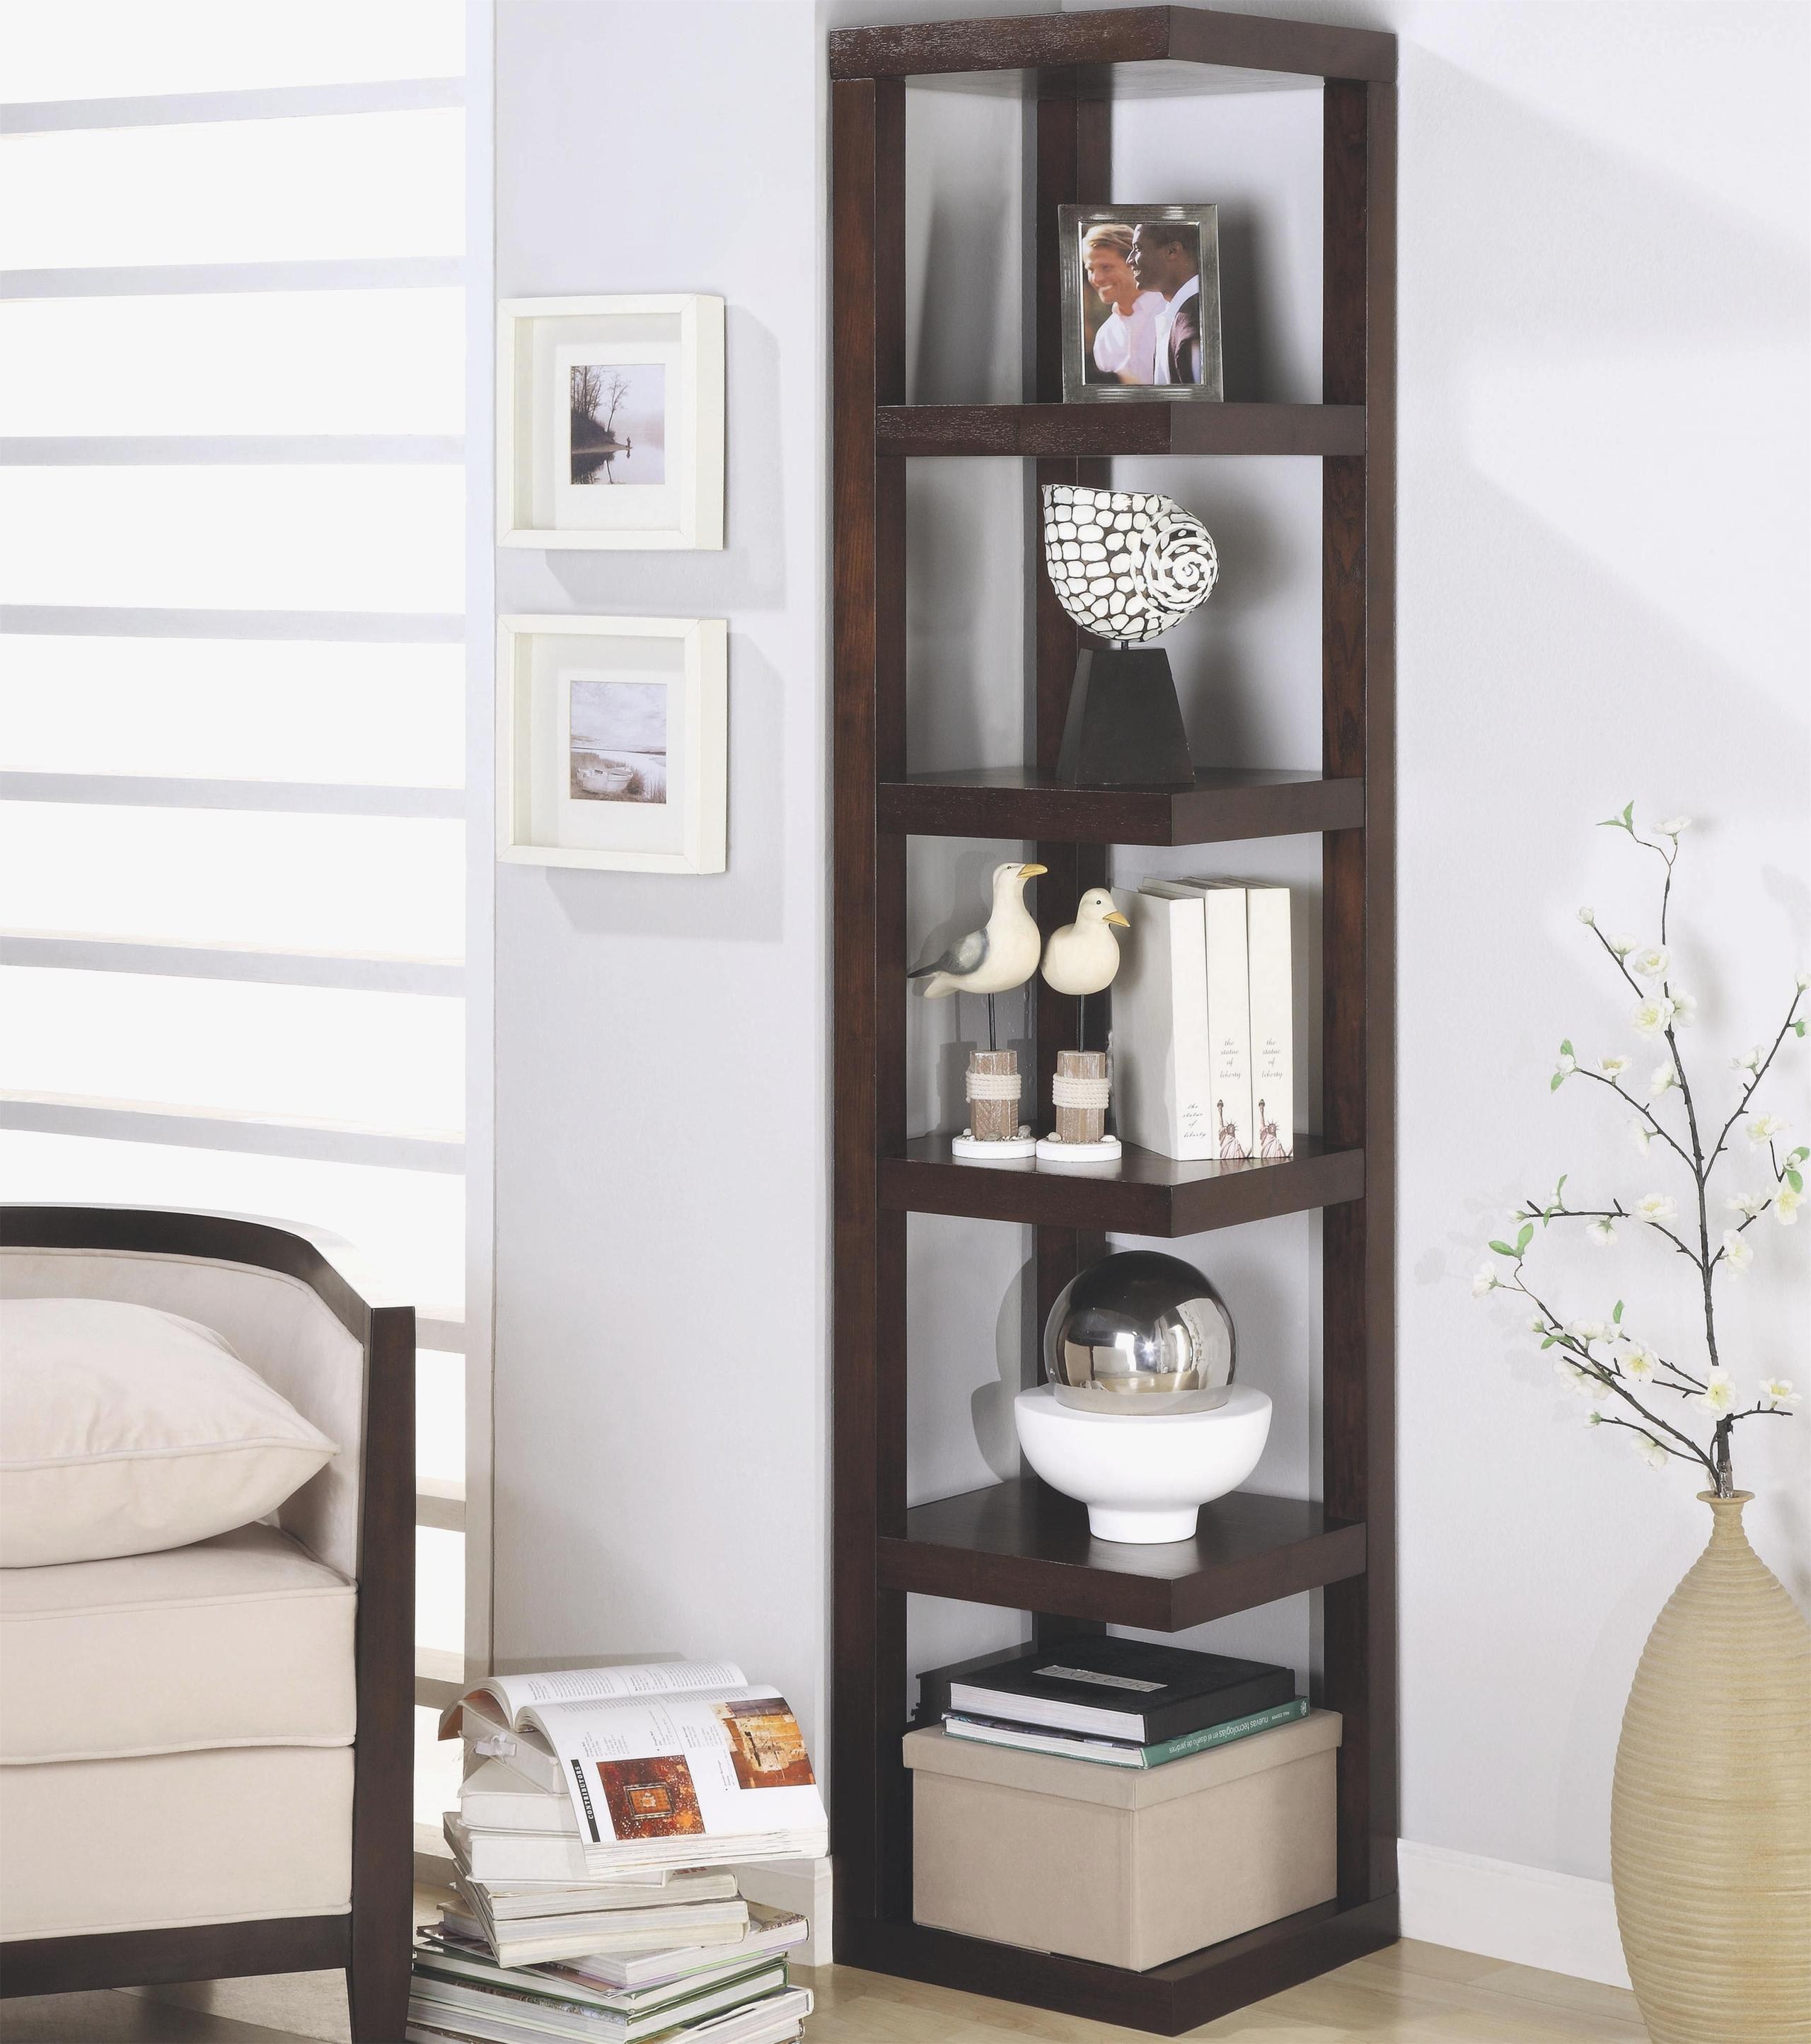 corner wall shelf unit ideas on foter rh foter com corner wall units for bedroom corner wall unit nz